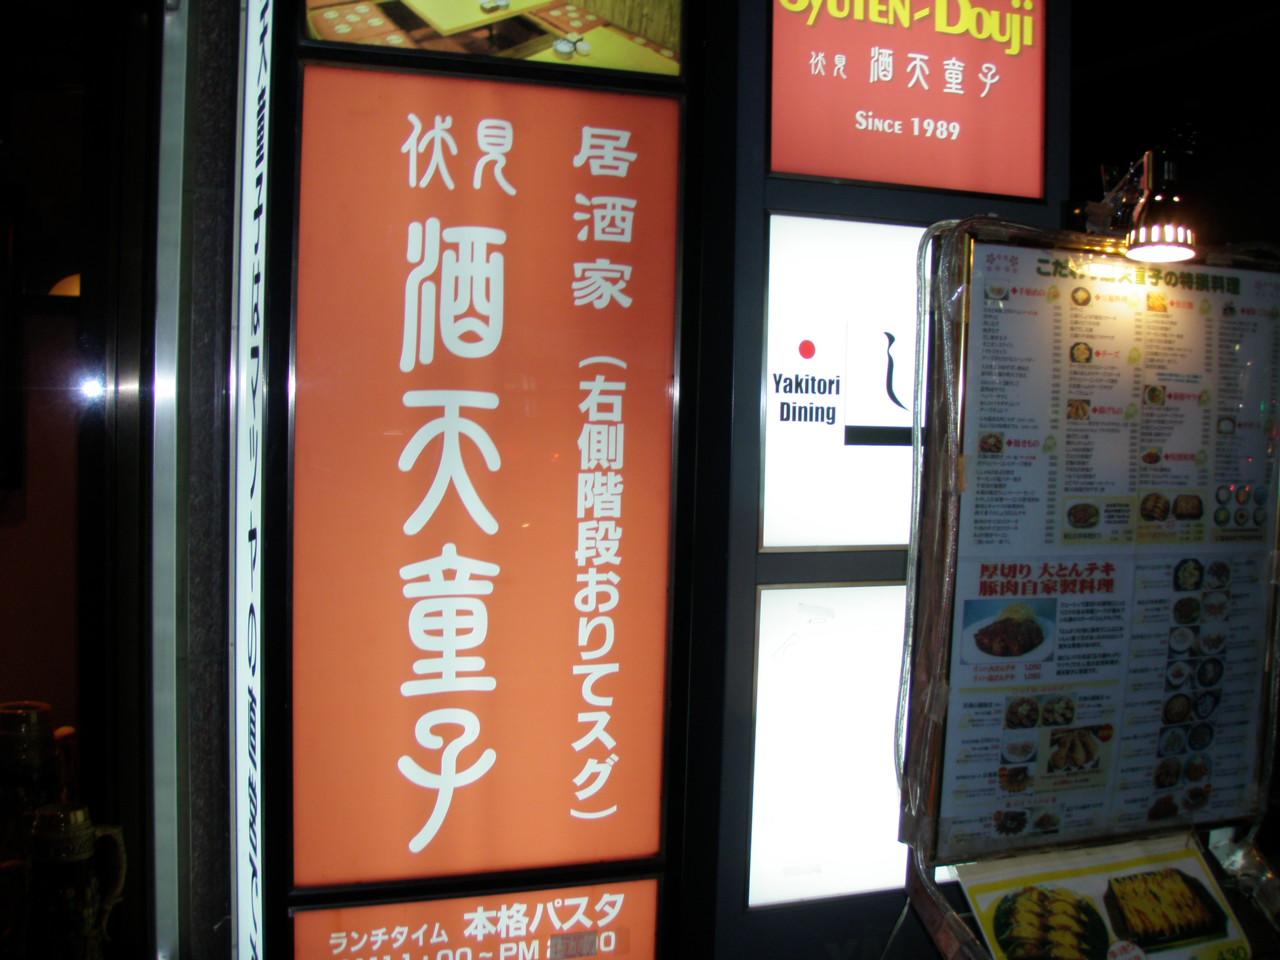 Syuten-Douji 伏見酒天童子